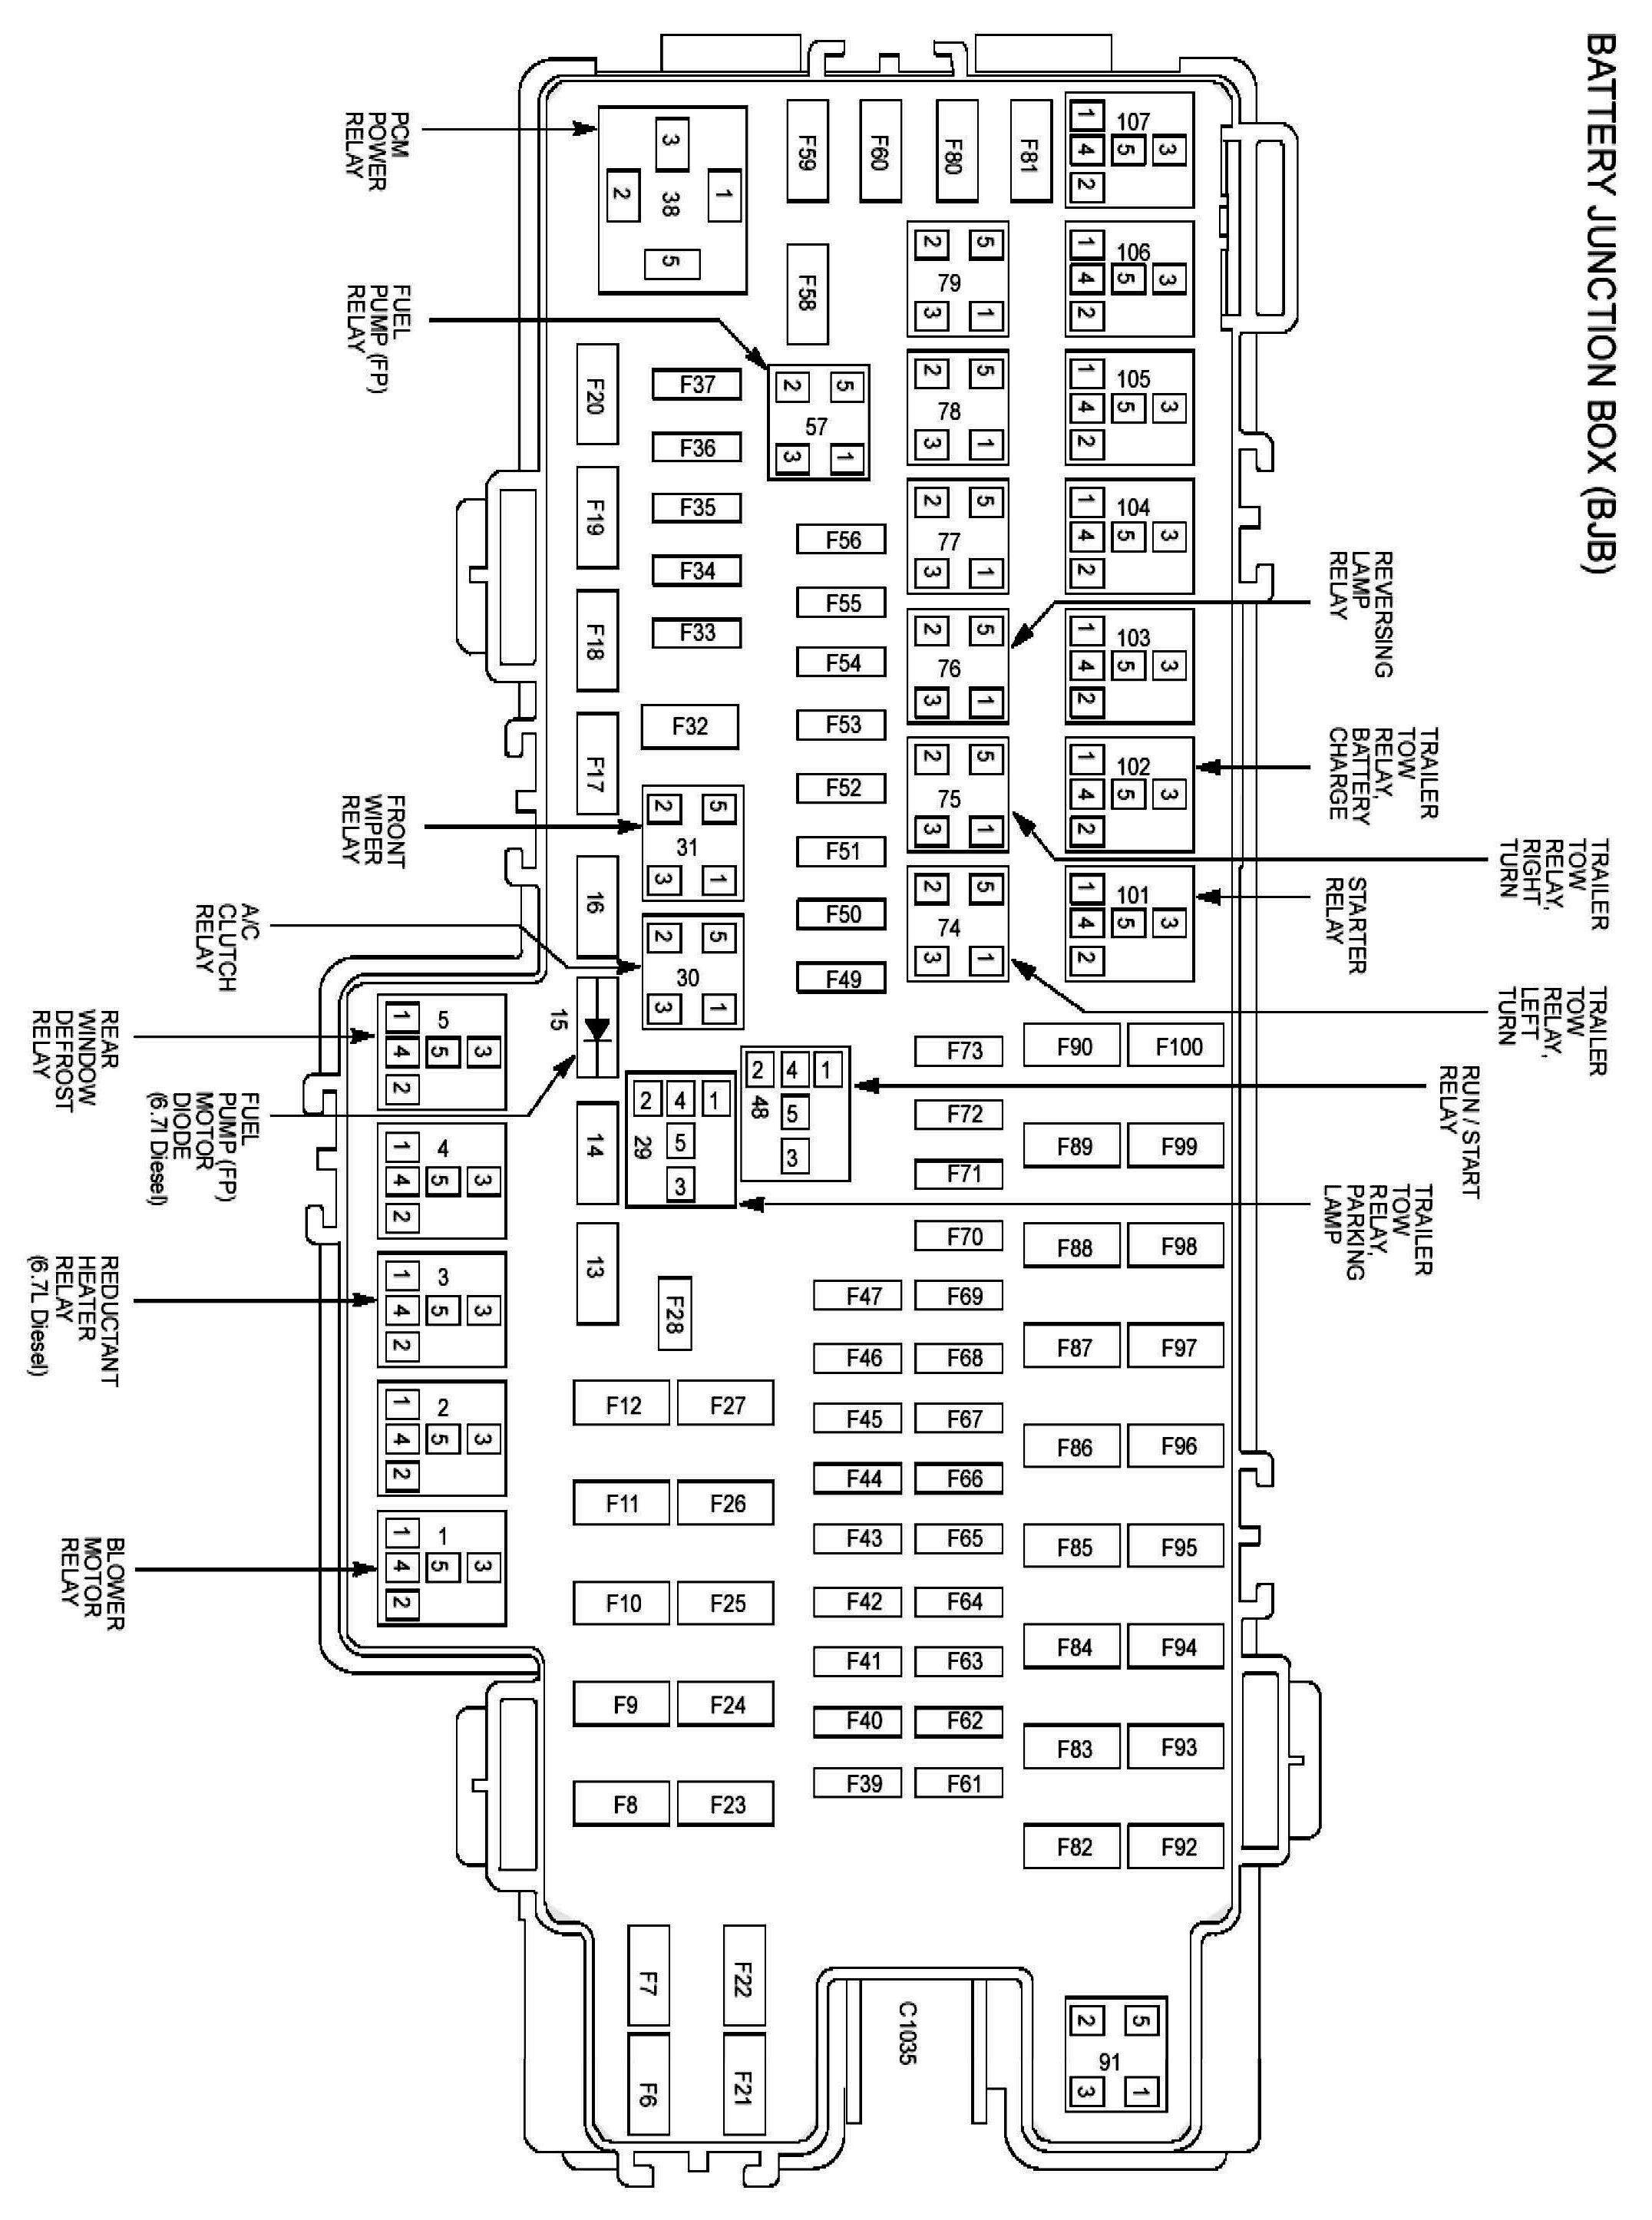 New Chrysler Electric Fan Wiring Diagram Fuse Box Diagram F150